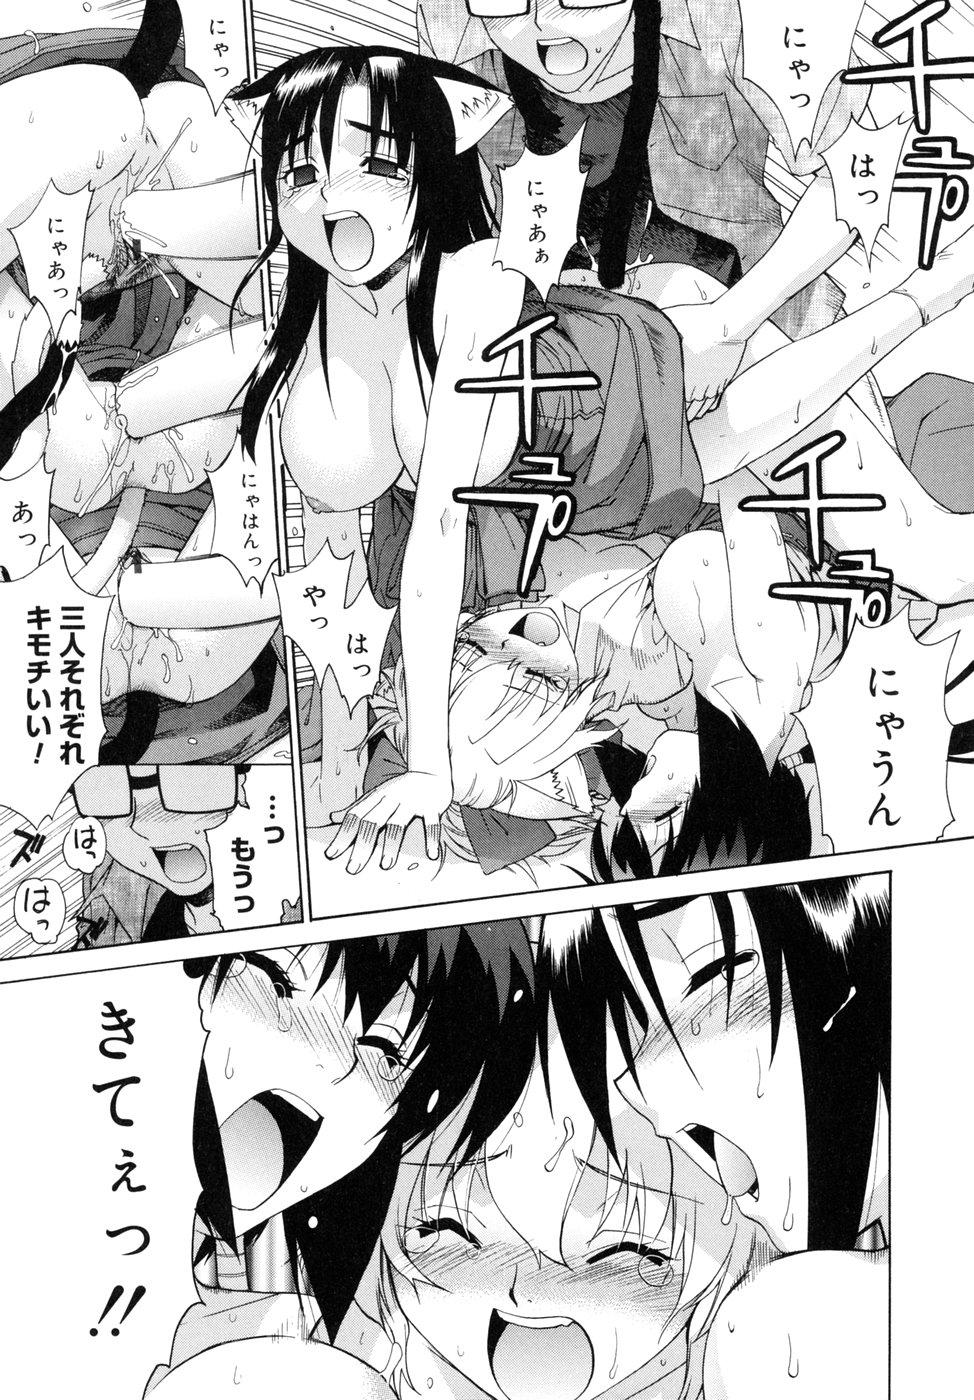 [Yaya Hinata] Tonari no Miko-san wa Minna Warau - The next shrine maidens smile in everyone. 170